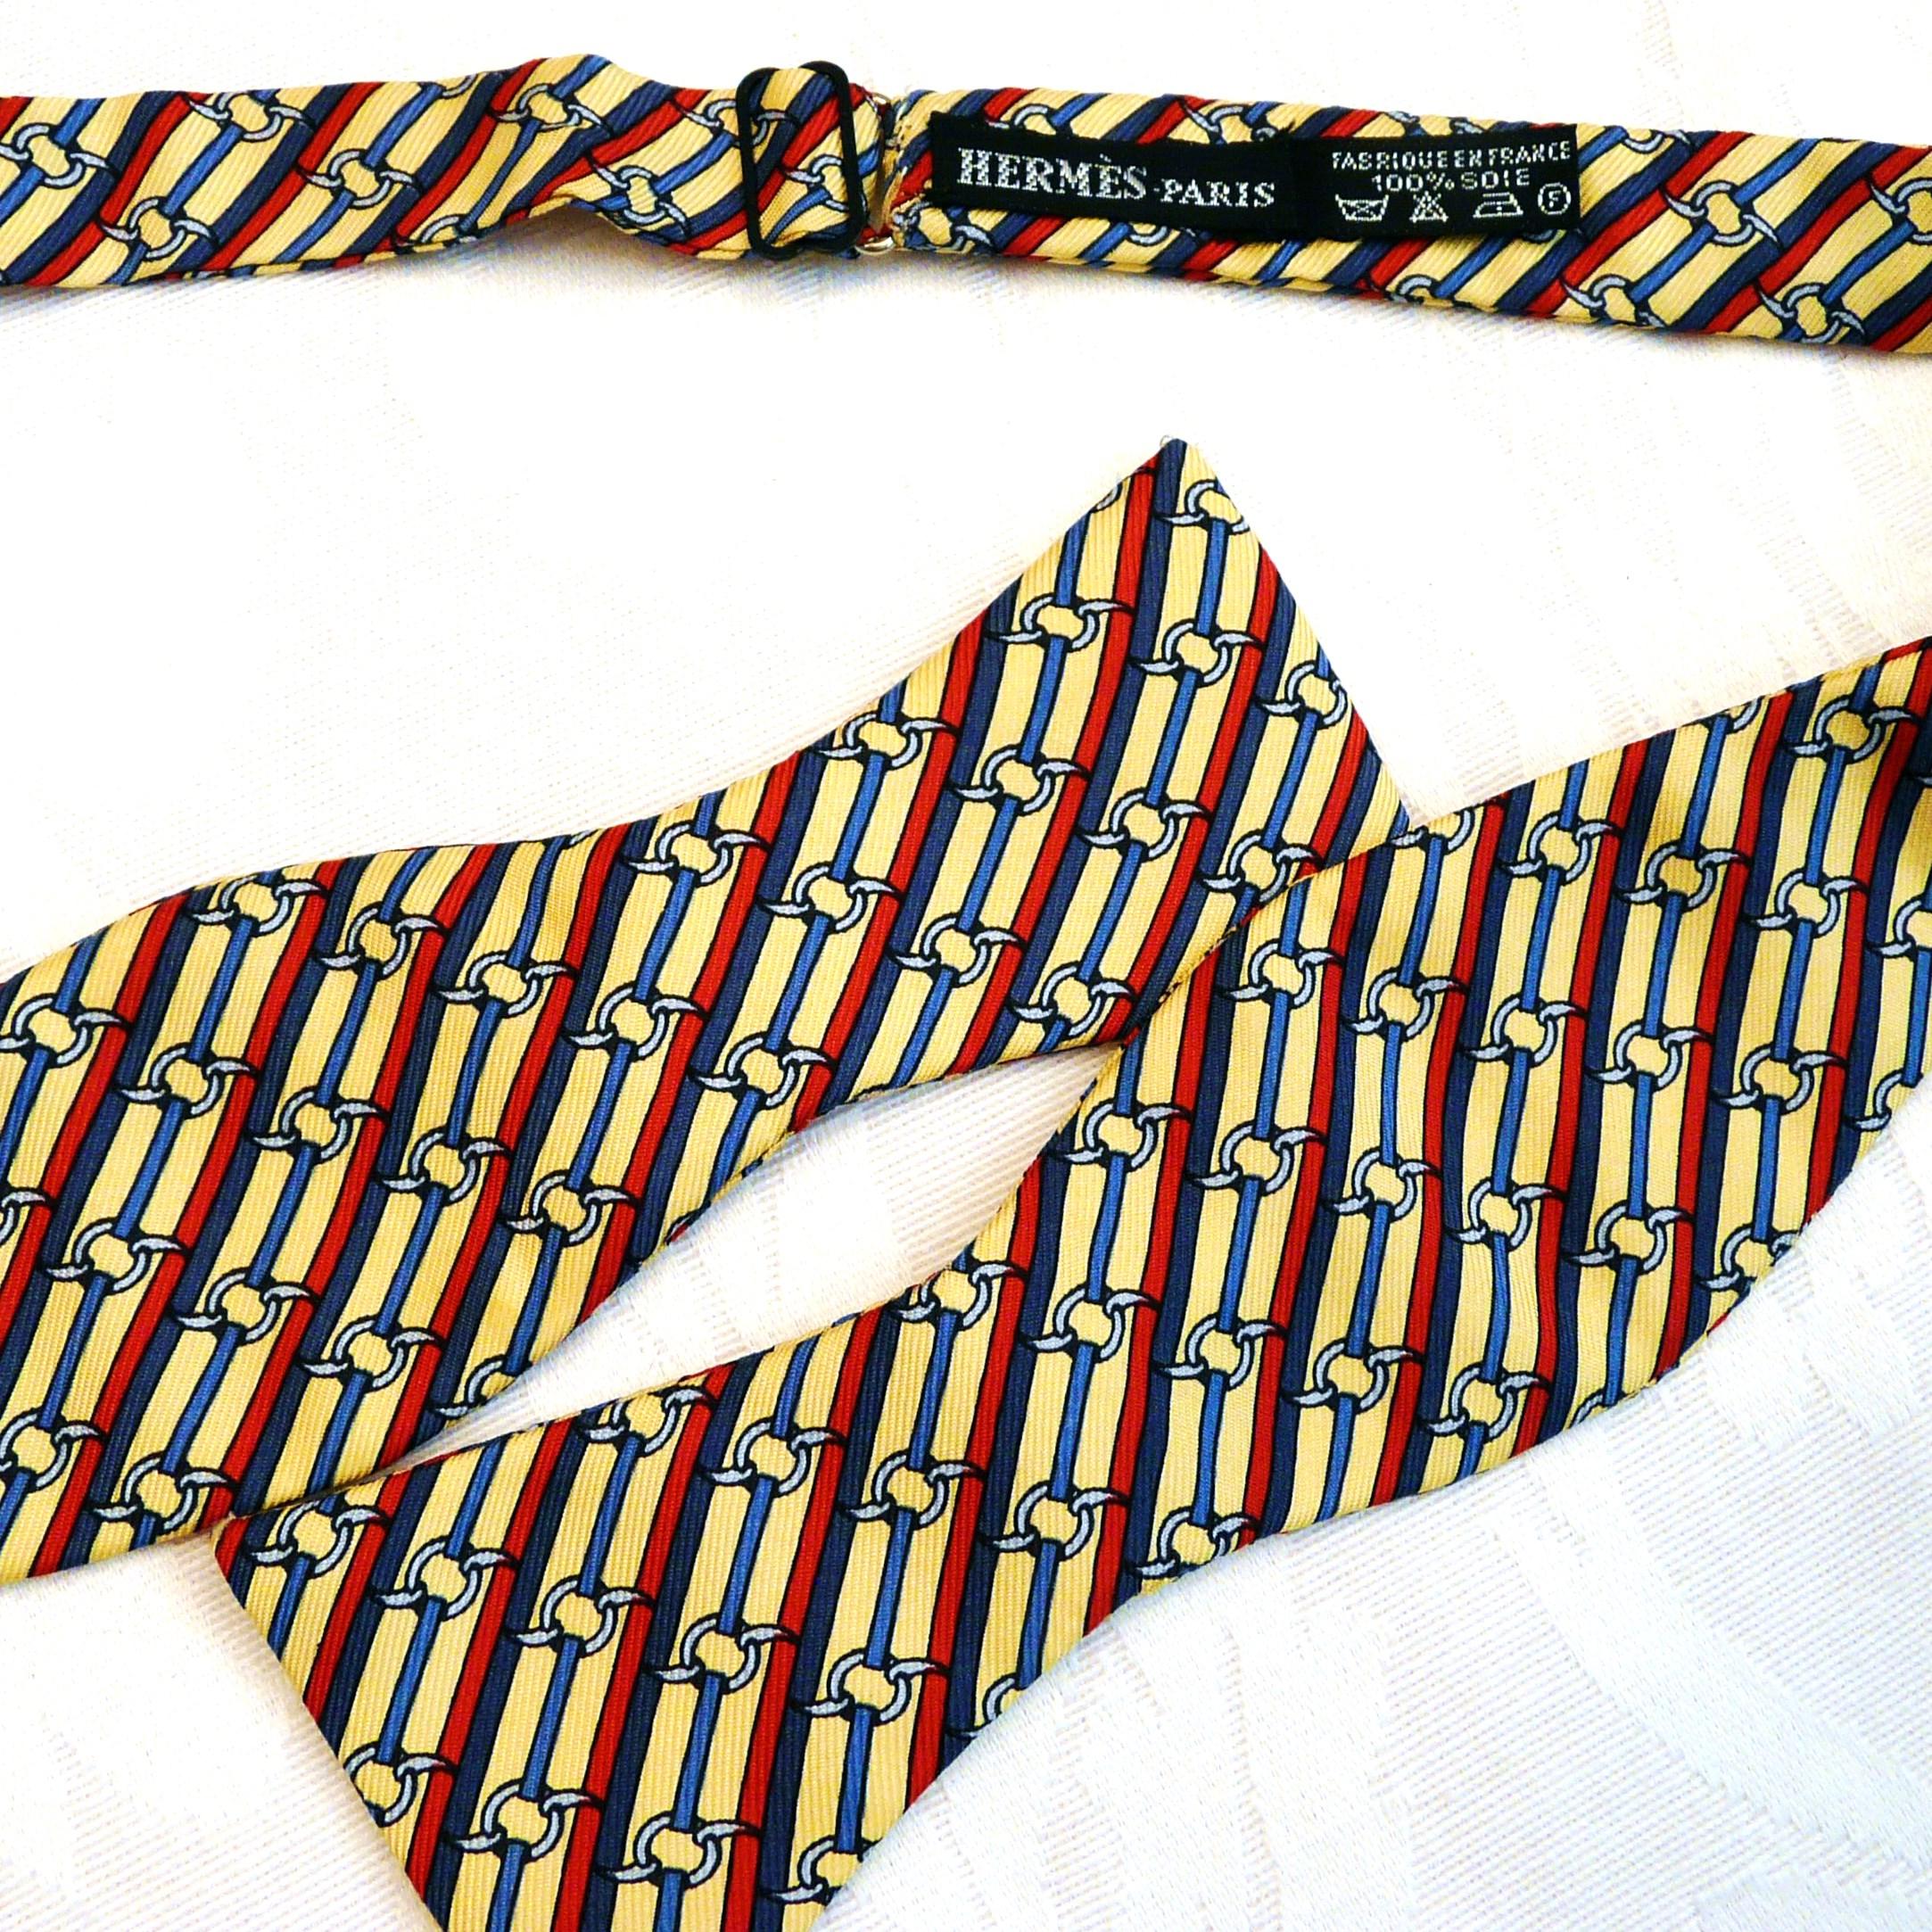 HERMES Vintage Silk Bowtie